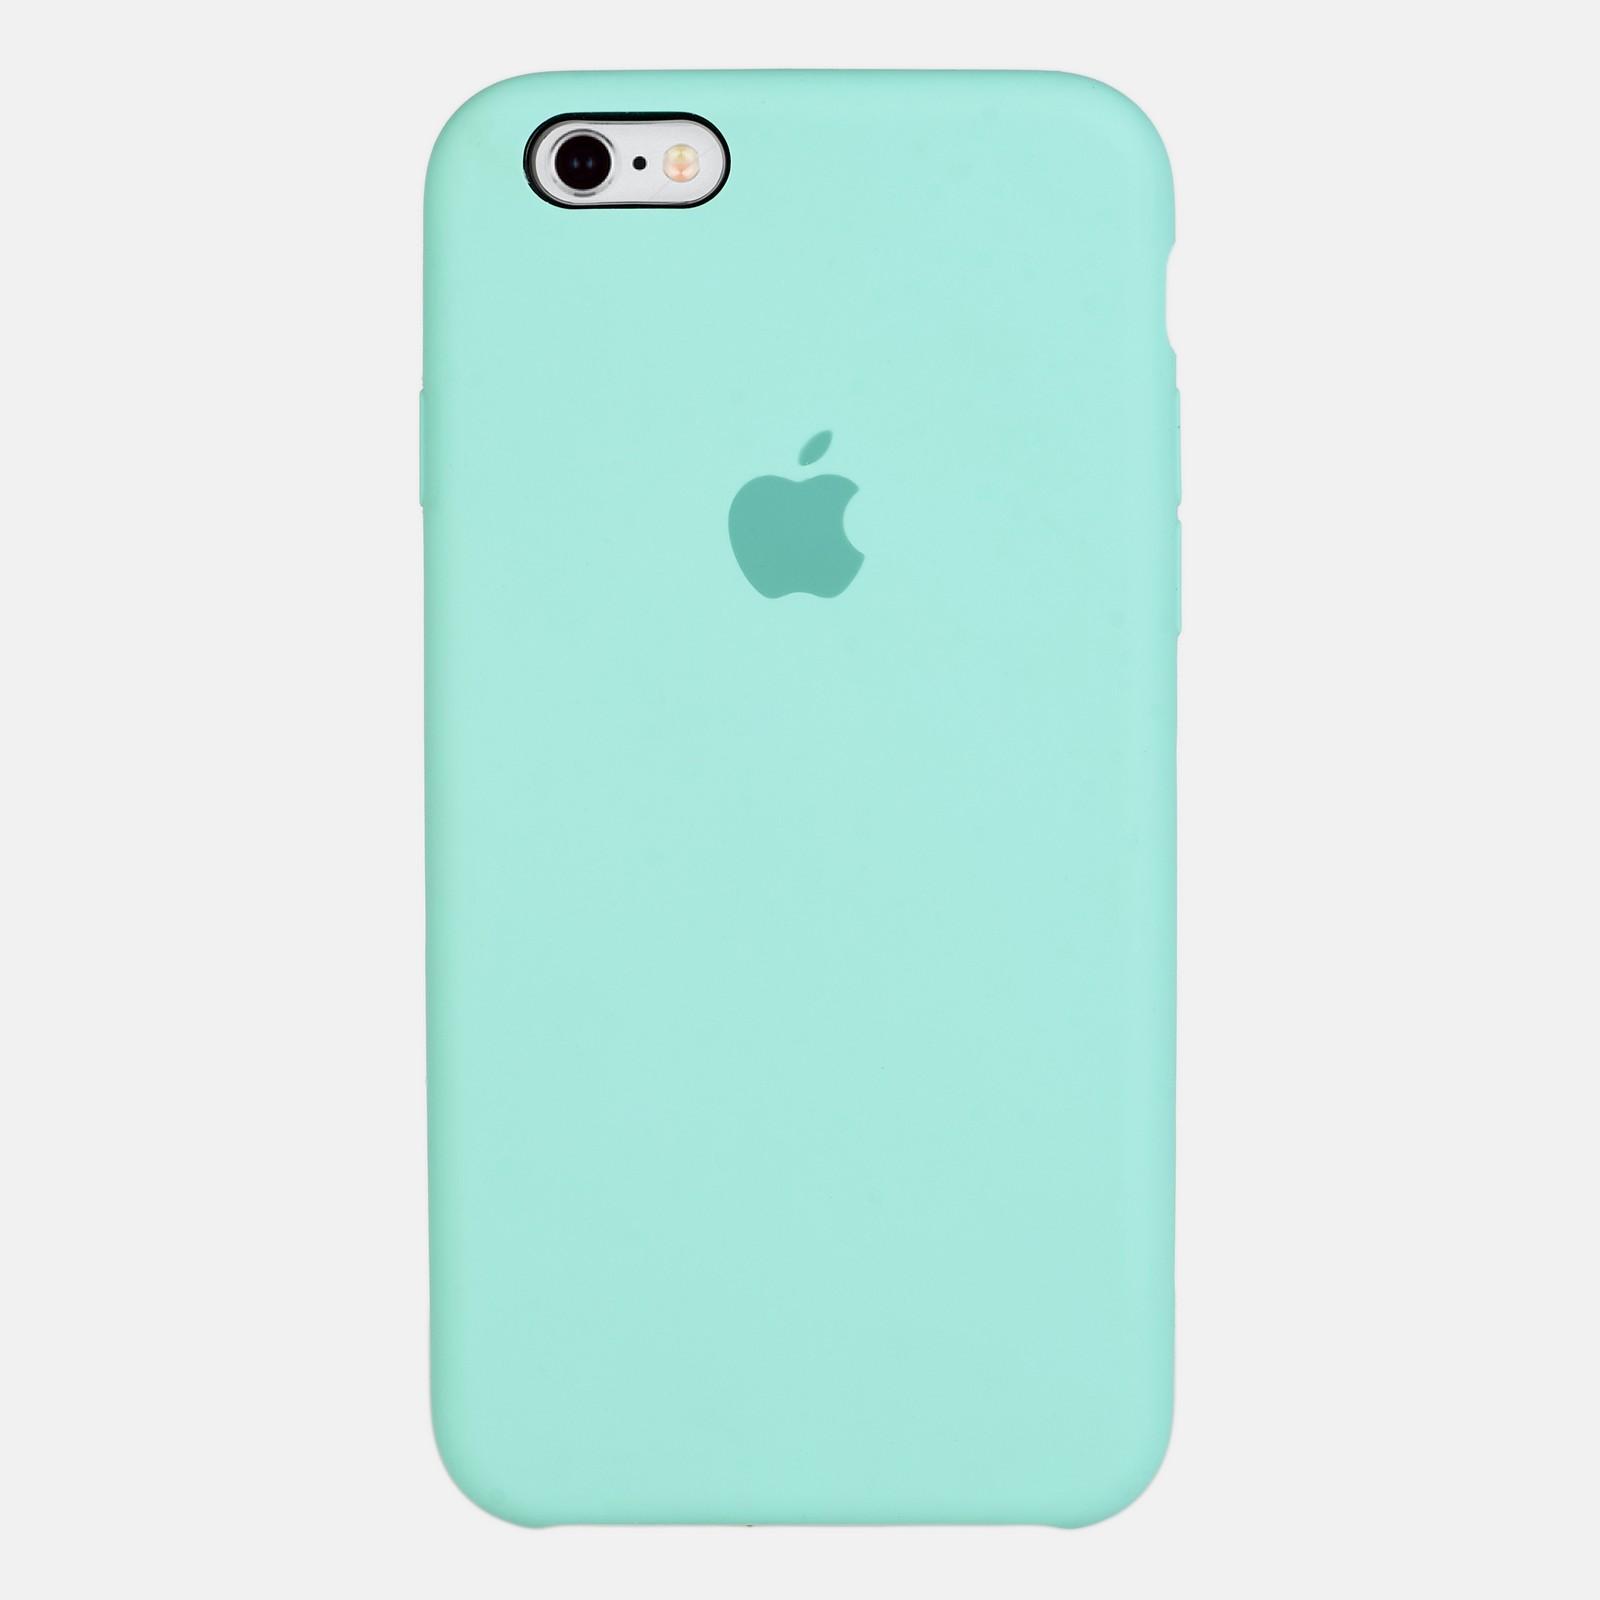 Бирюзовый чехол Silicone Case для iPhone 6/6S